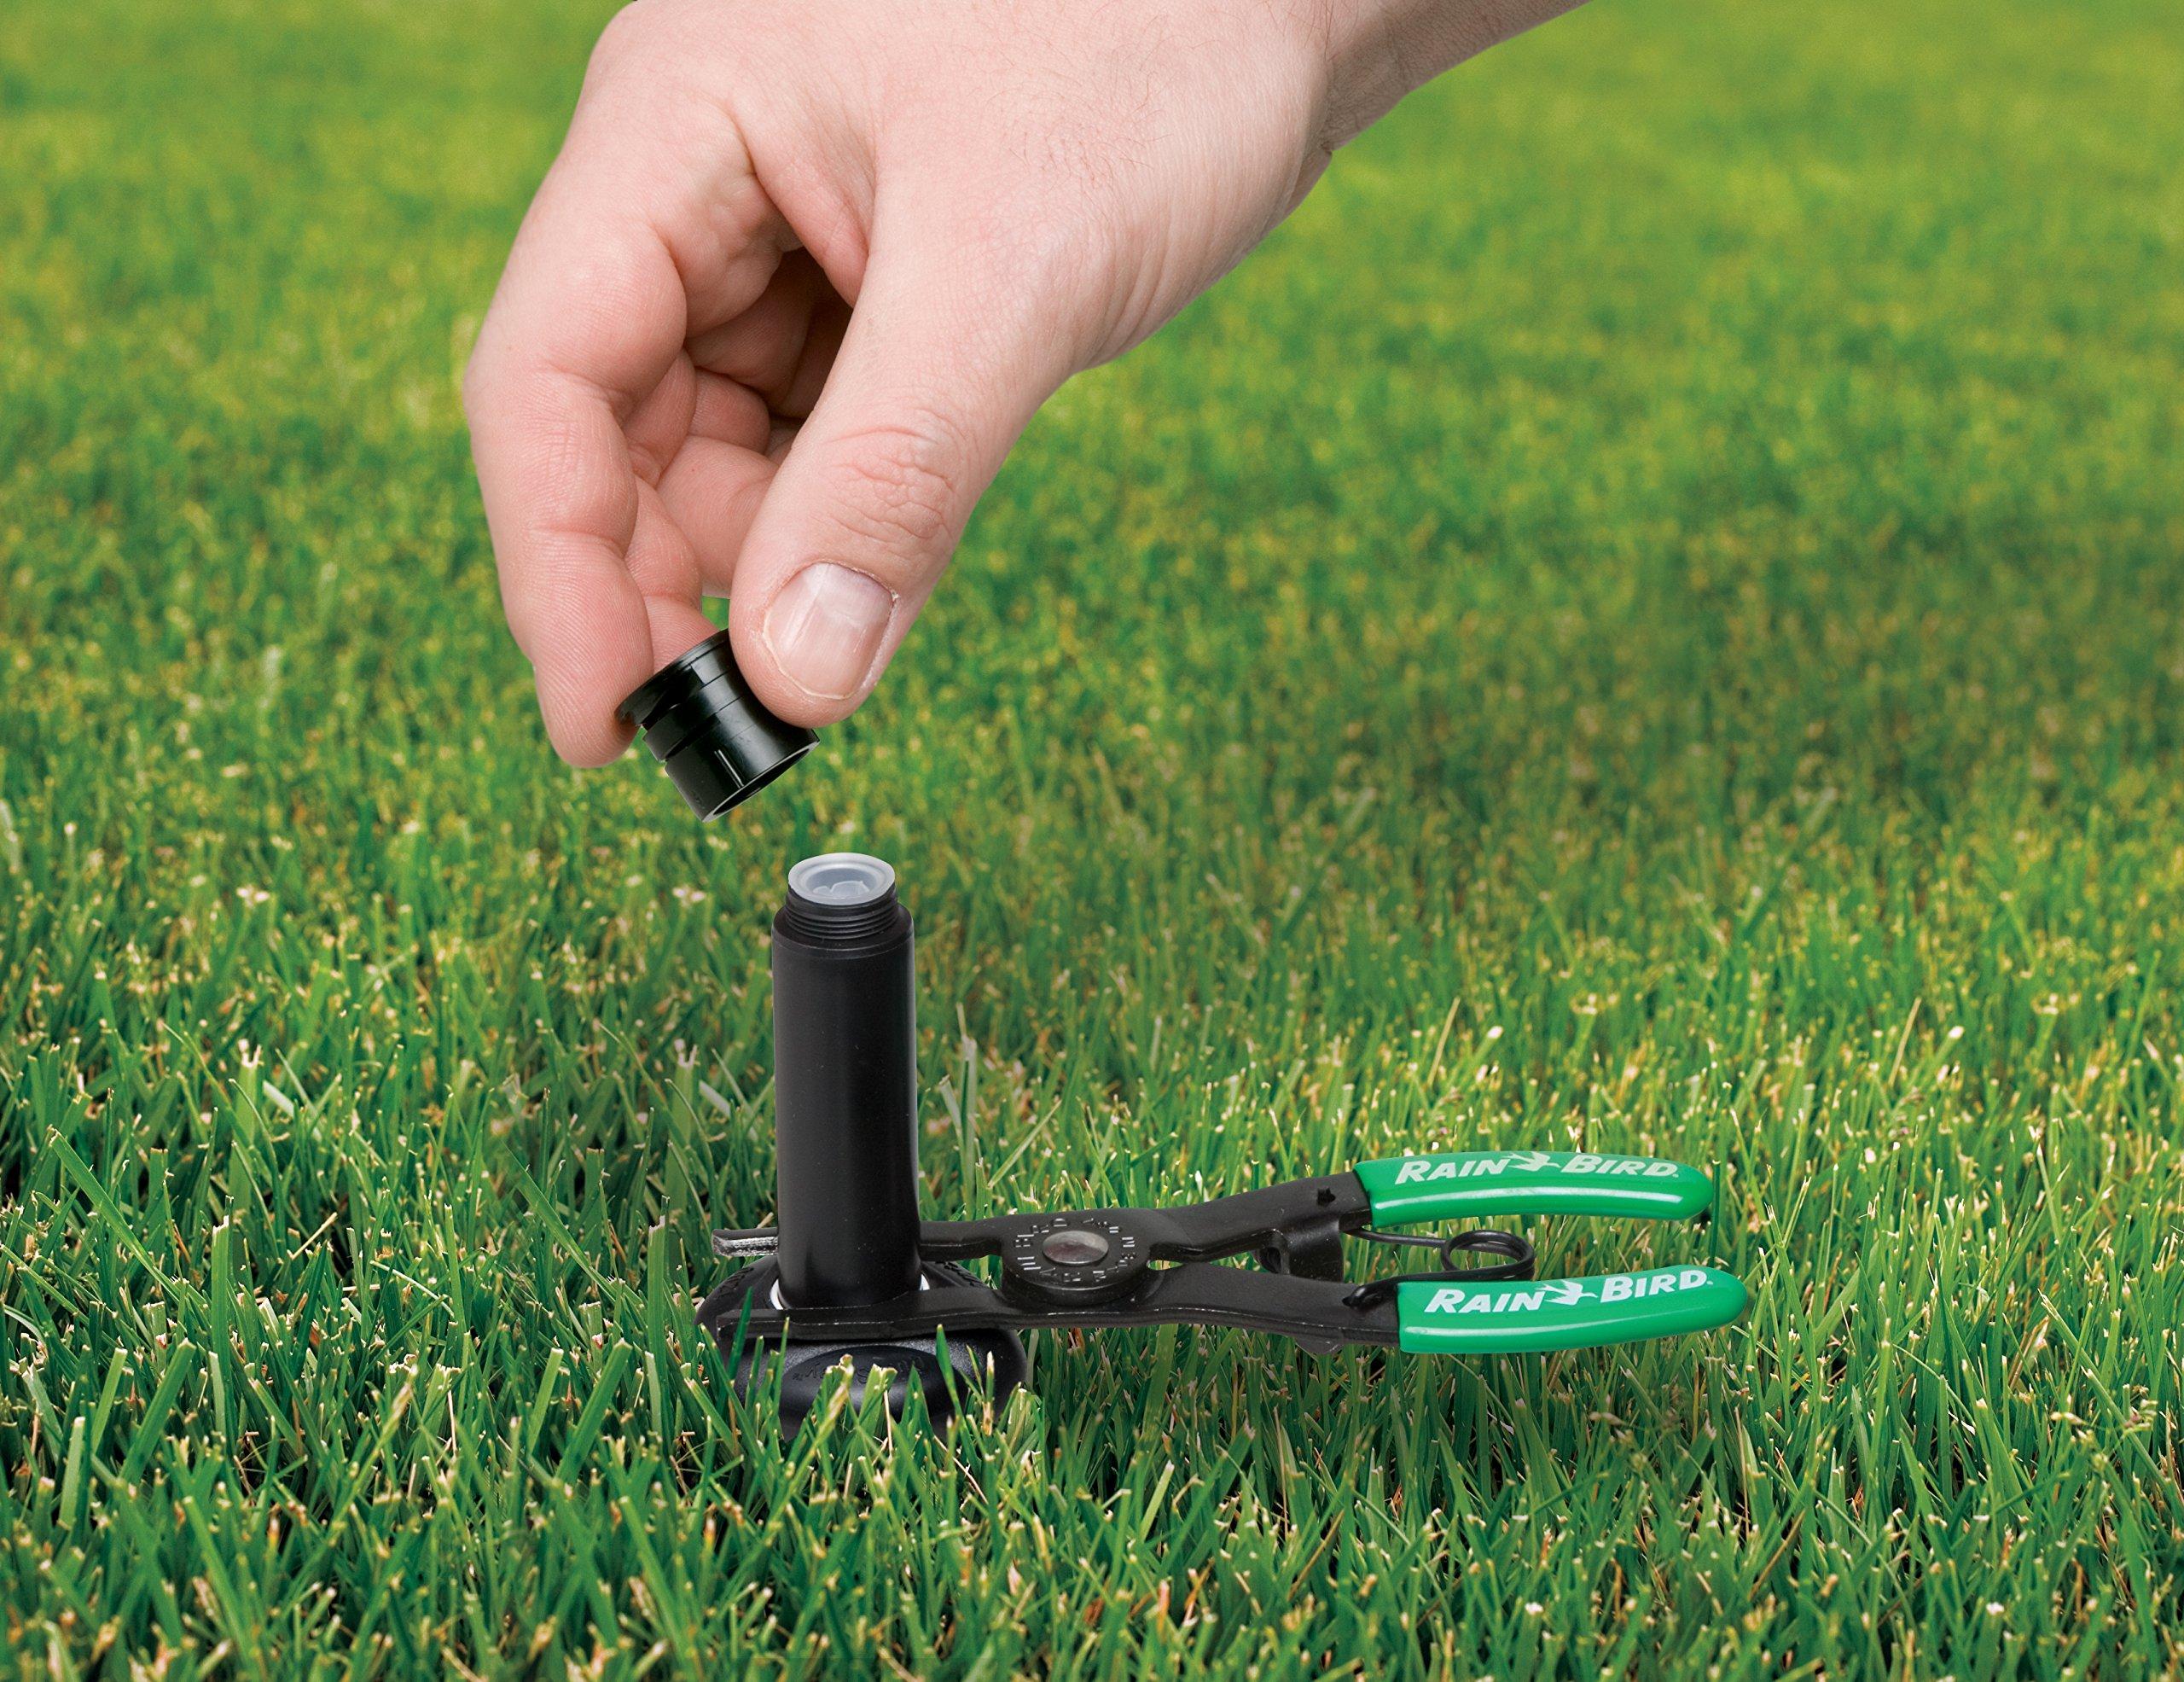 Rain Bird PTC1 Spray Head Pull-Up Tool for Pop-Up Sprinklers